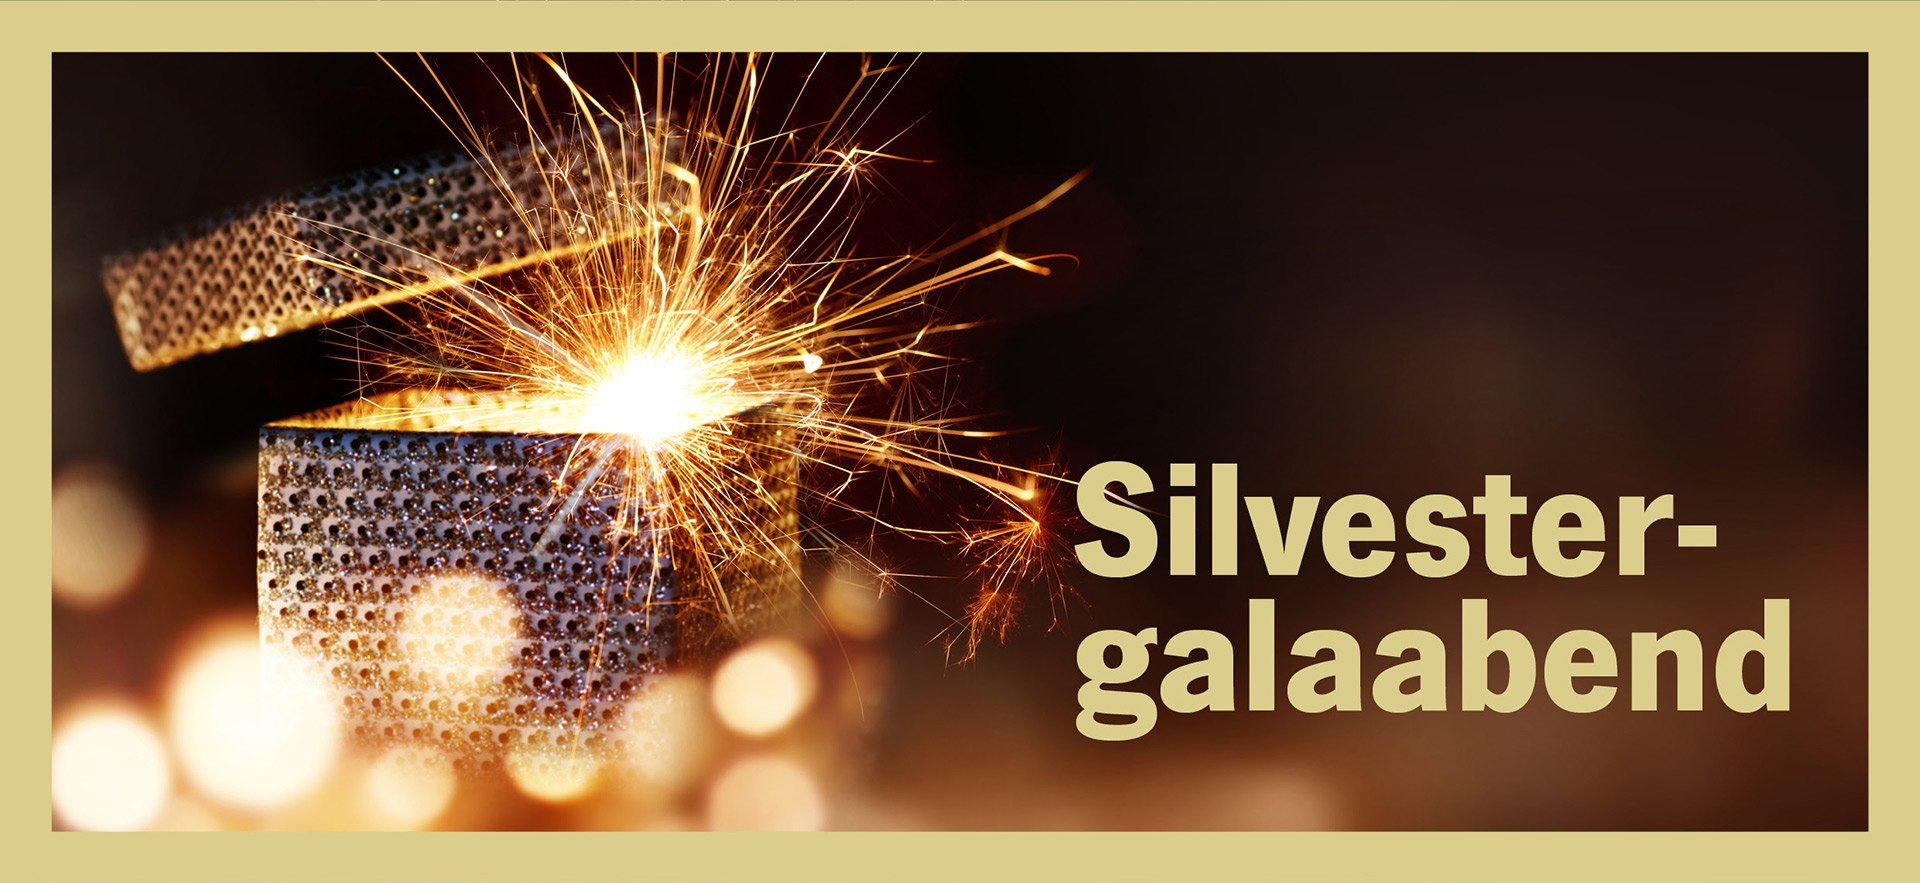 Silvester Gala-Abend 2017